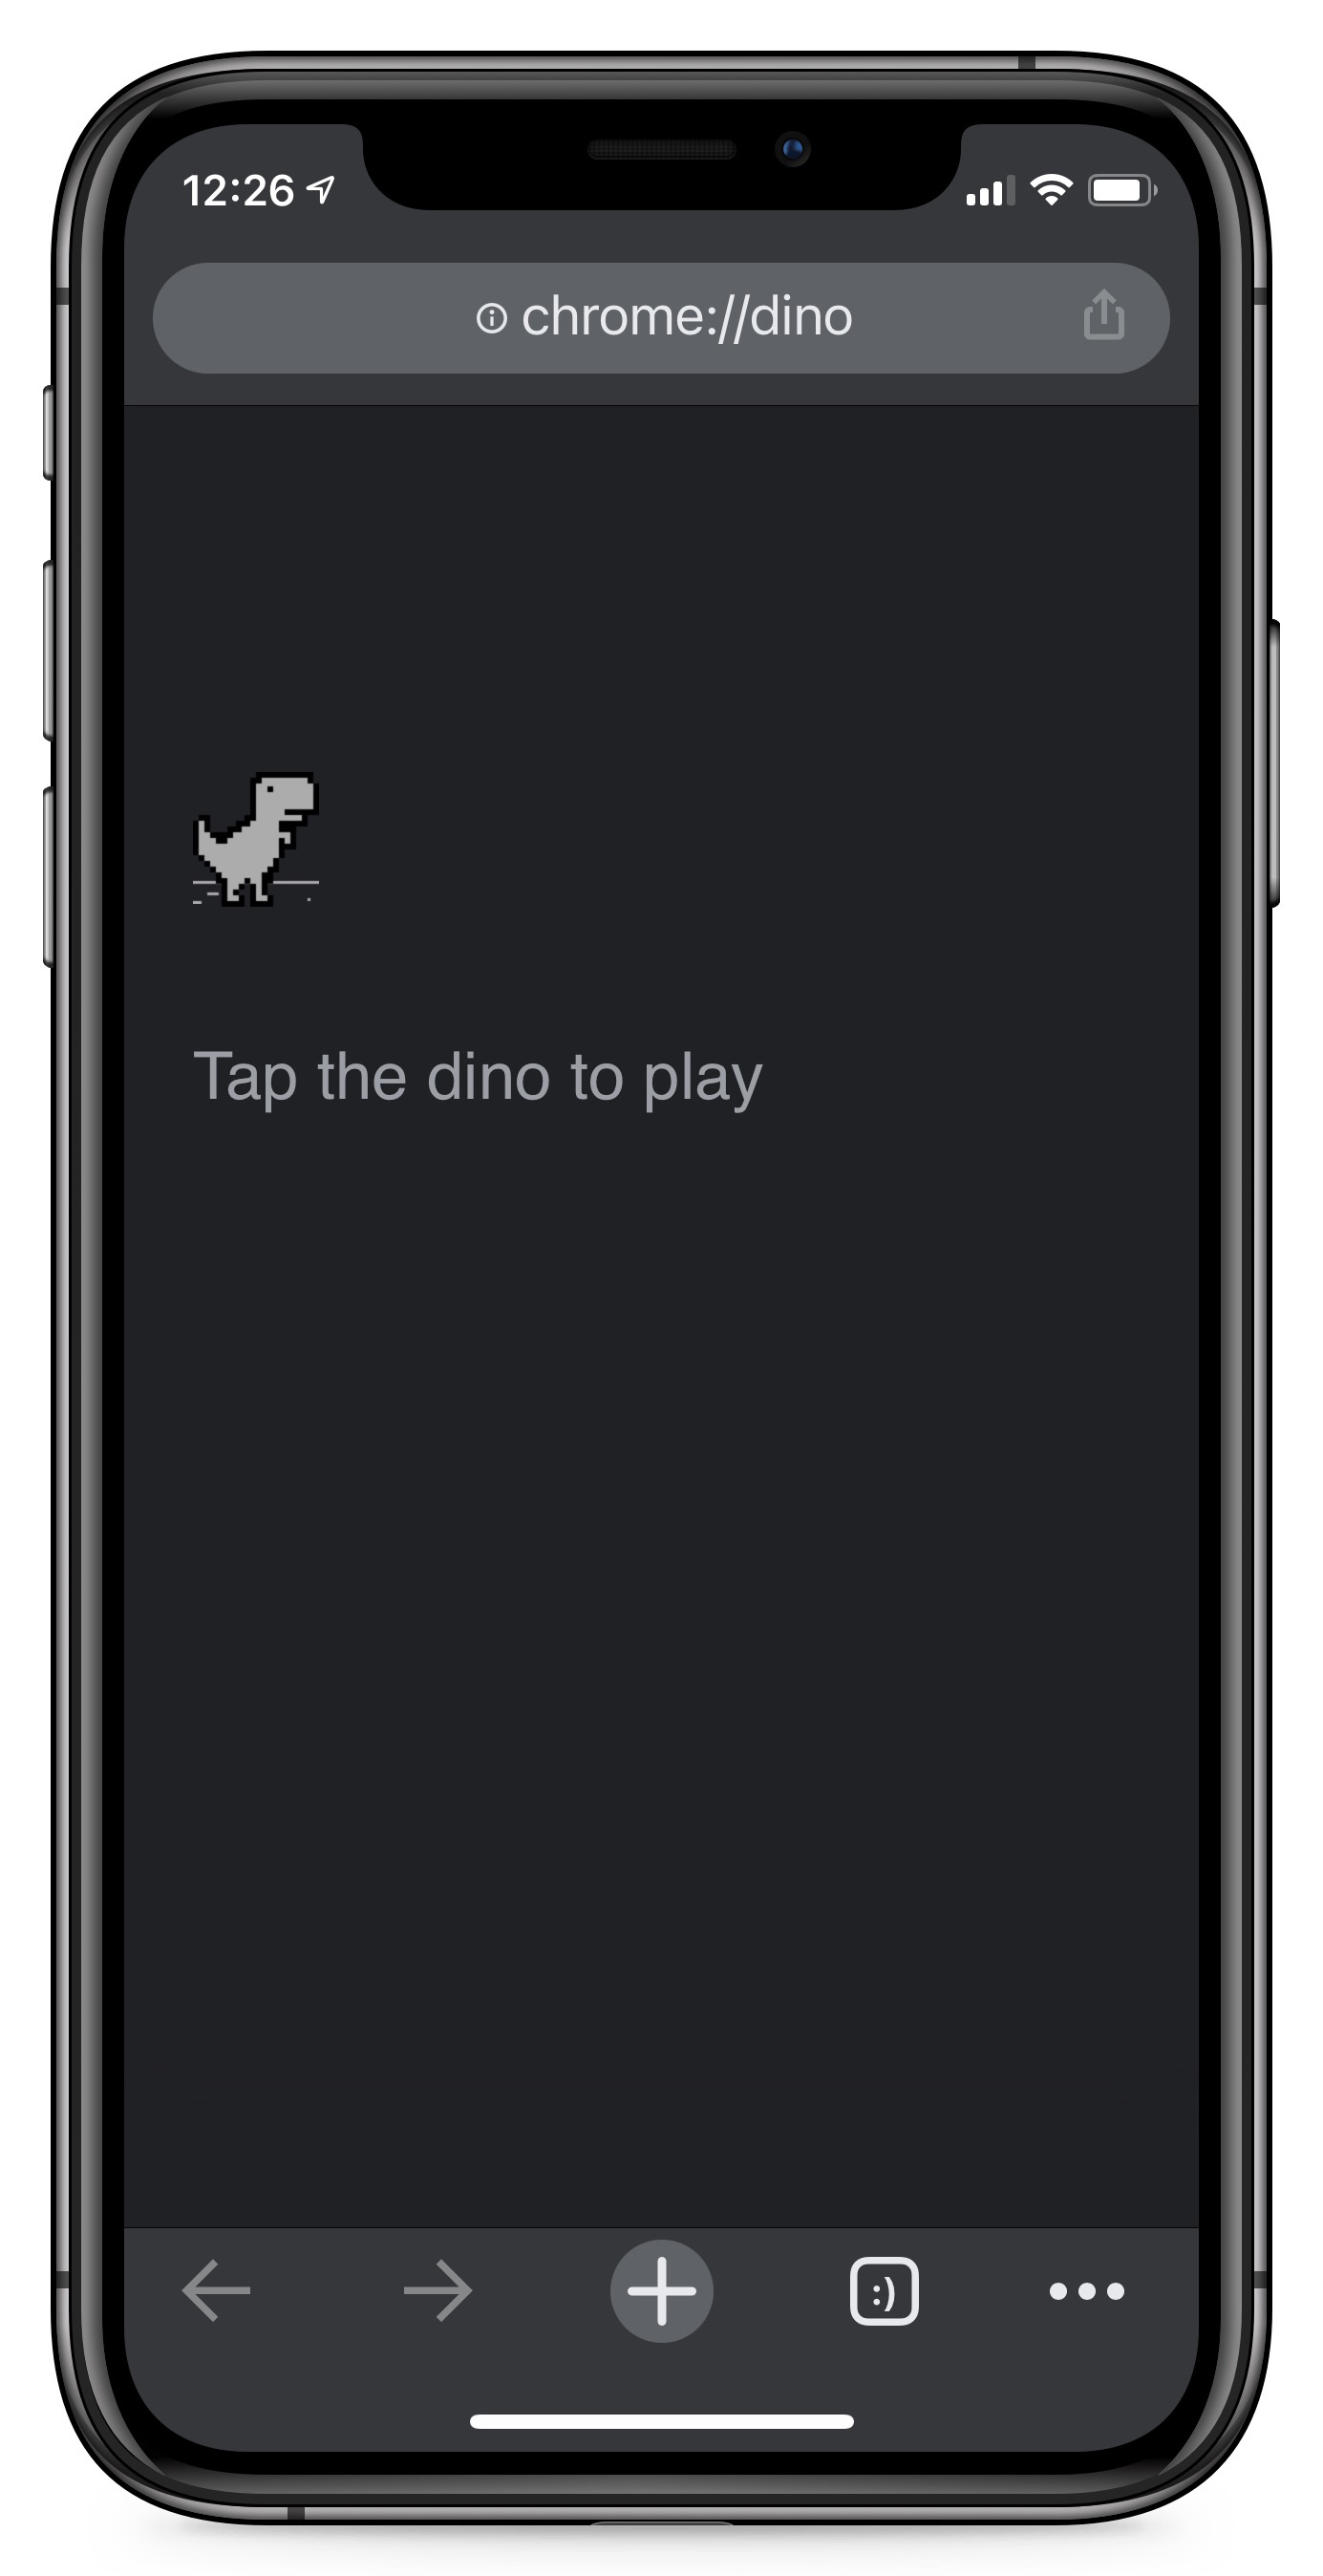 Dinosaur Game in Google Chrome Beta